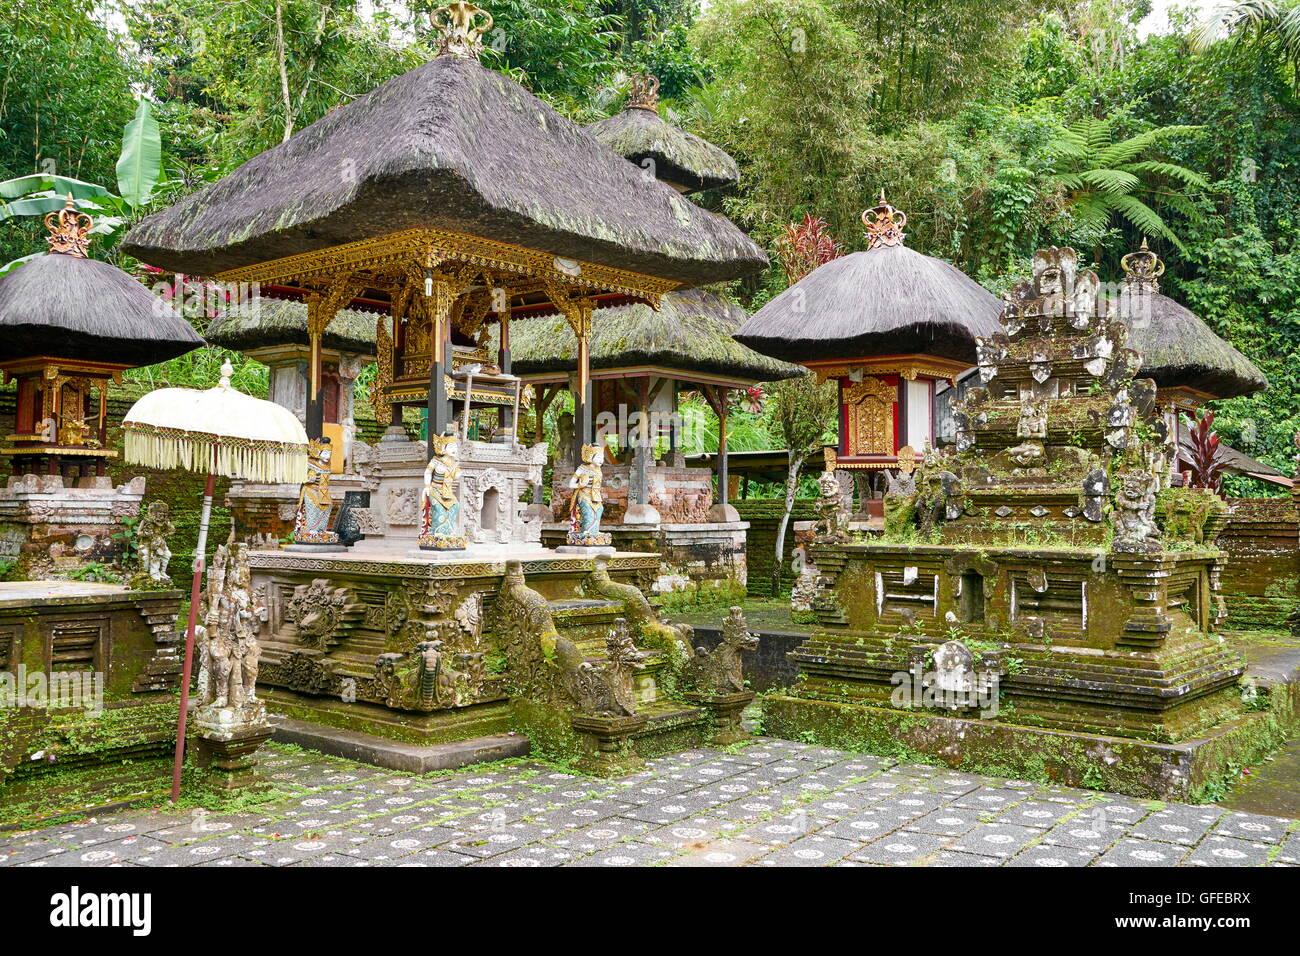 Pura Gunung Kawi Temple, Bali, Indonesia - Stock Image